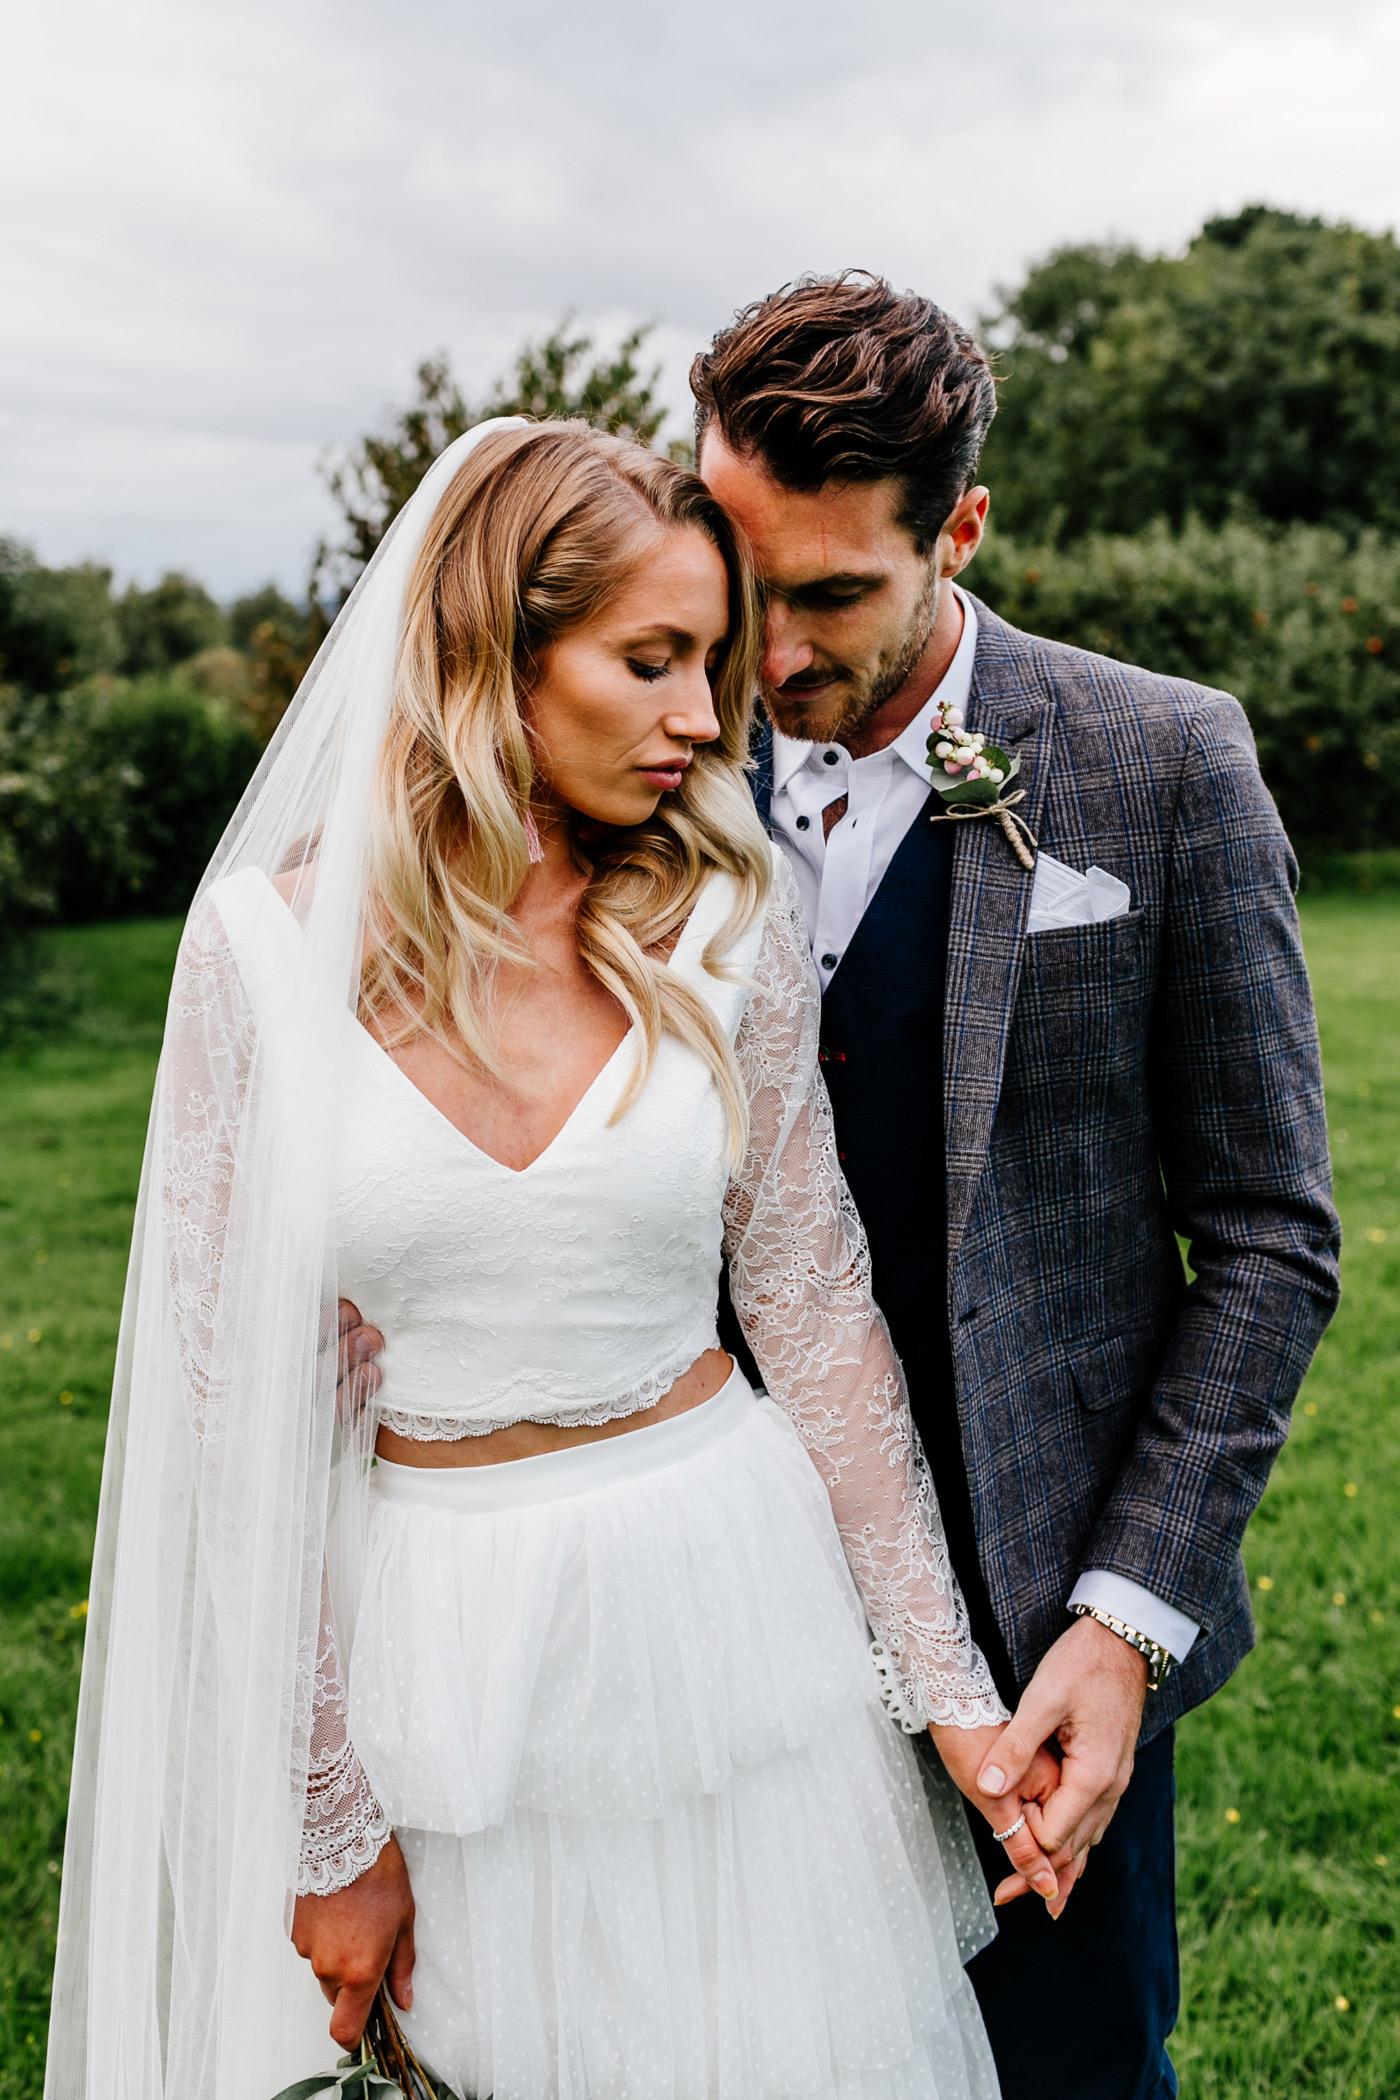 KENT-ELOPEMENT-wedding-photographer-UK-London-Epic-Love-Story-011